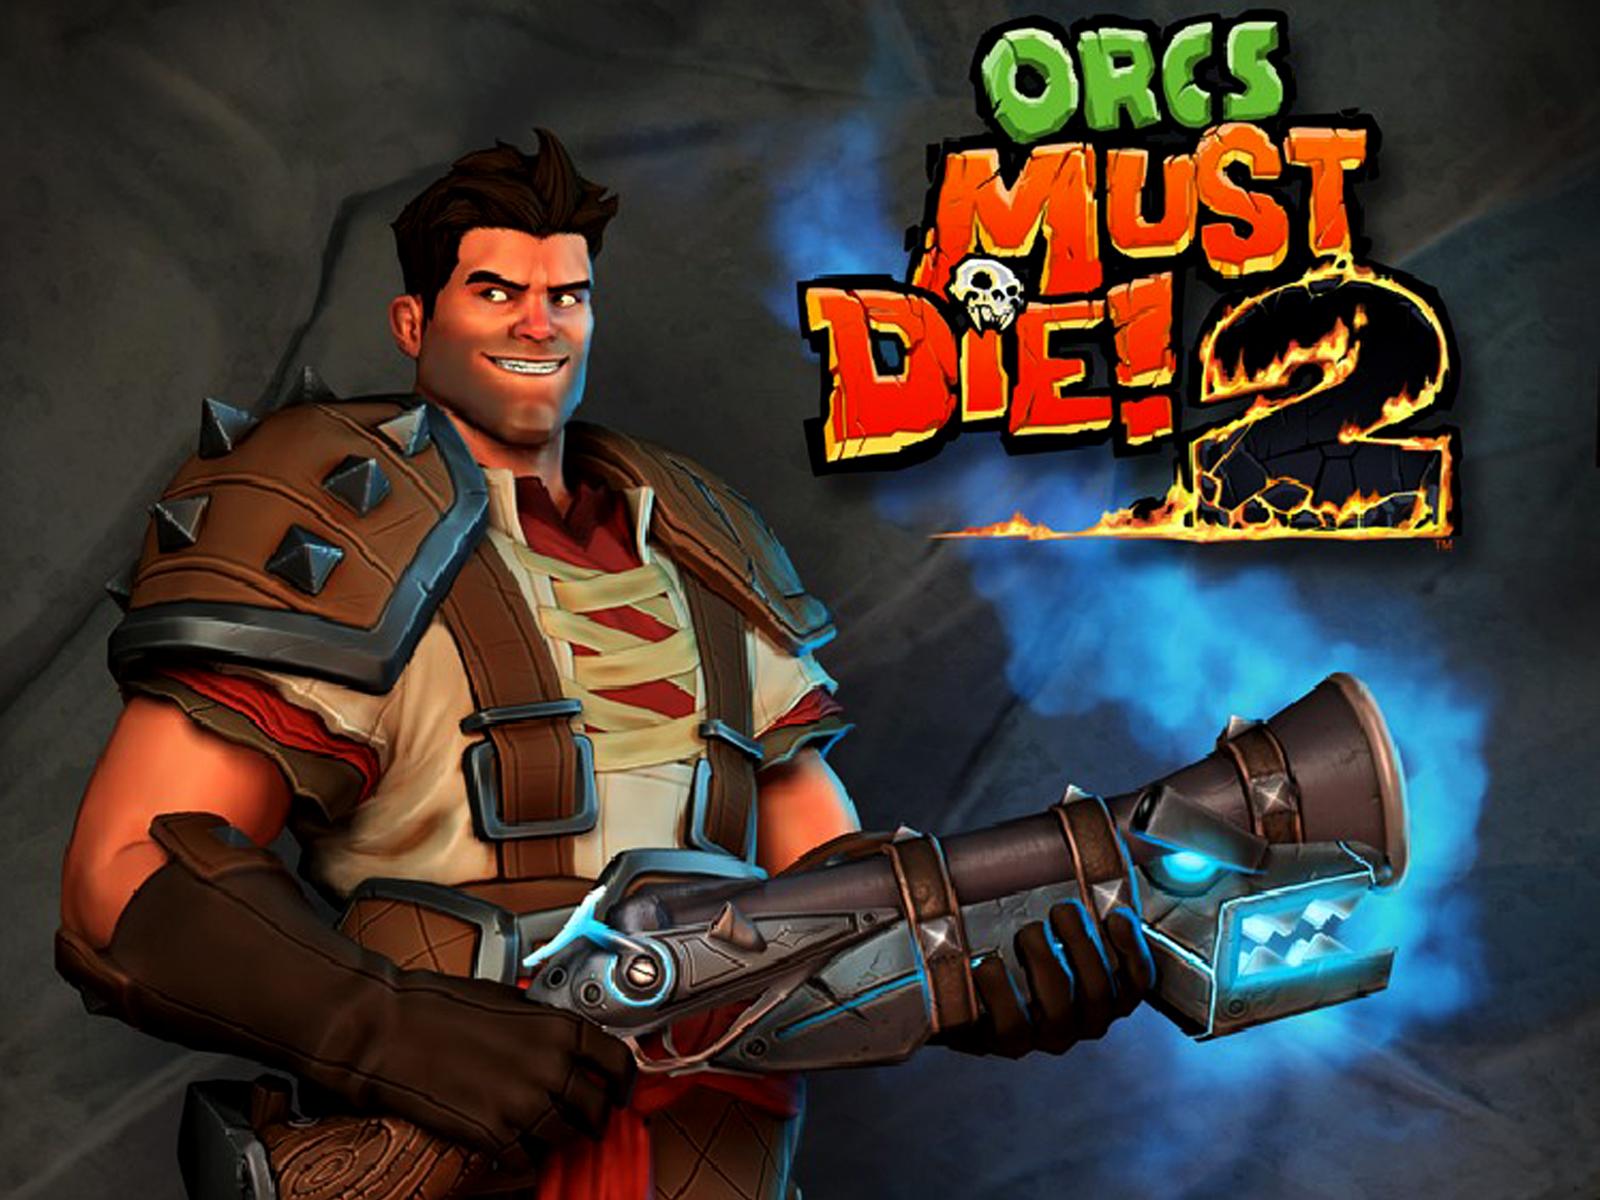 http://1.bp.blogspot.com/-TYRdTzQwtkw/UDyxtH92LhI/AAAAAAAAEAE/31B4GLhKbV0/s1600/Orcs_Must_Die_2_Game_Character_Wallpaper-GameWallBase.Com.jpg